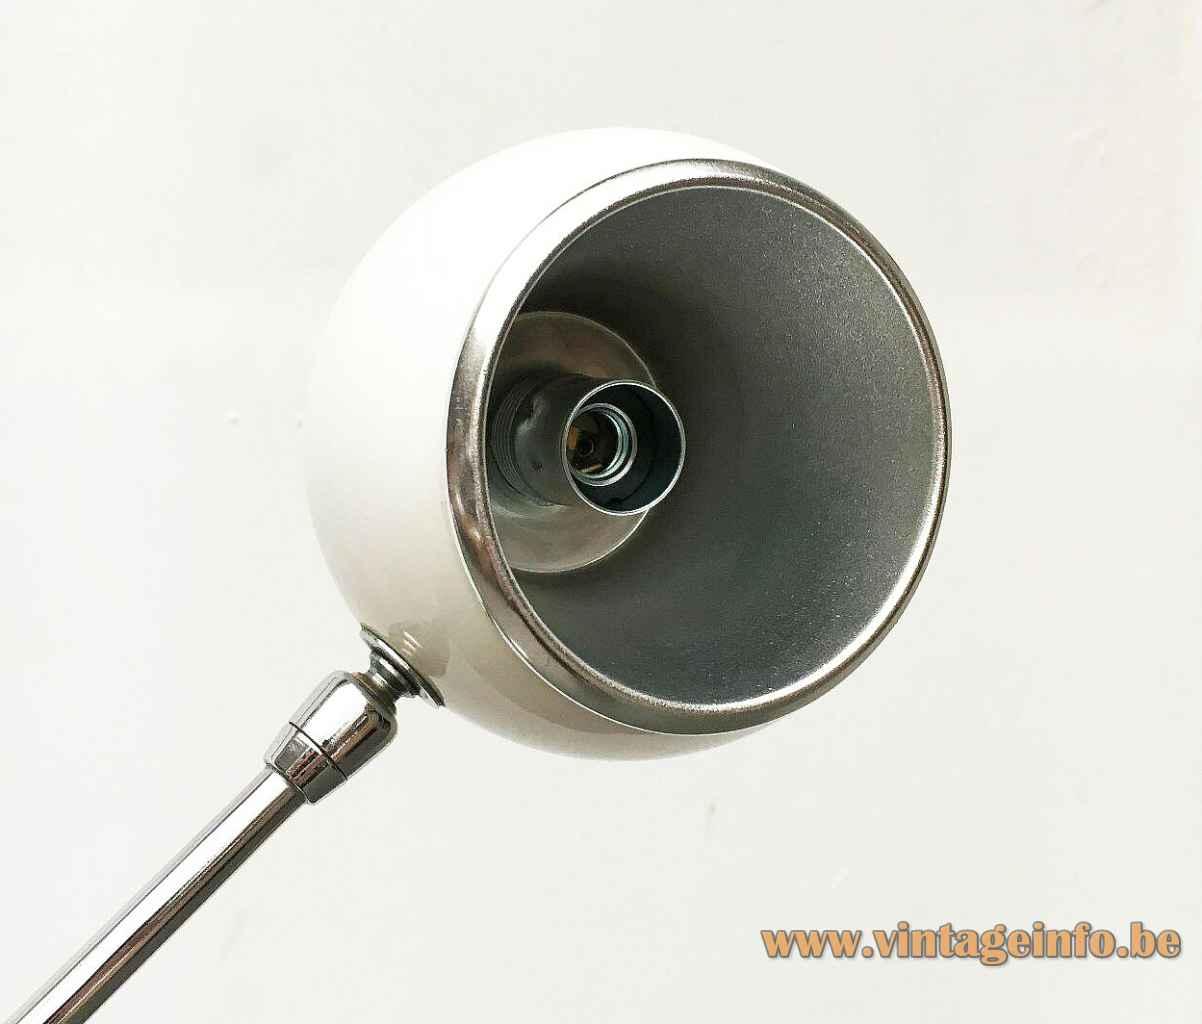 Sonneman Orbiter floor lamp white metal eyeball globe lampshade 1960s LUCI illuminazione Italy